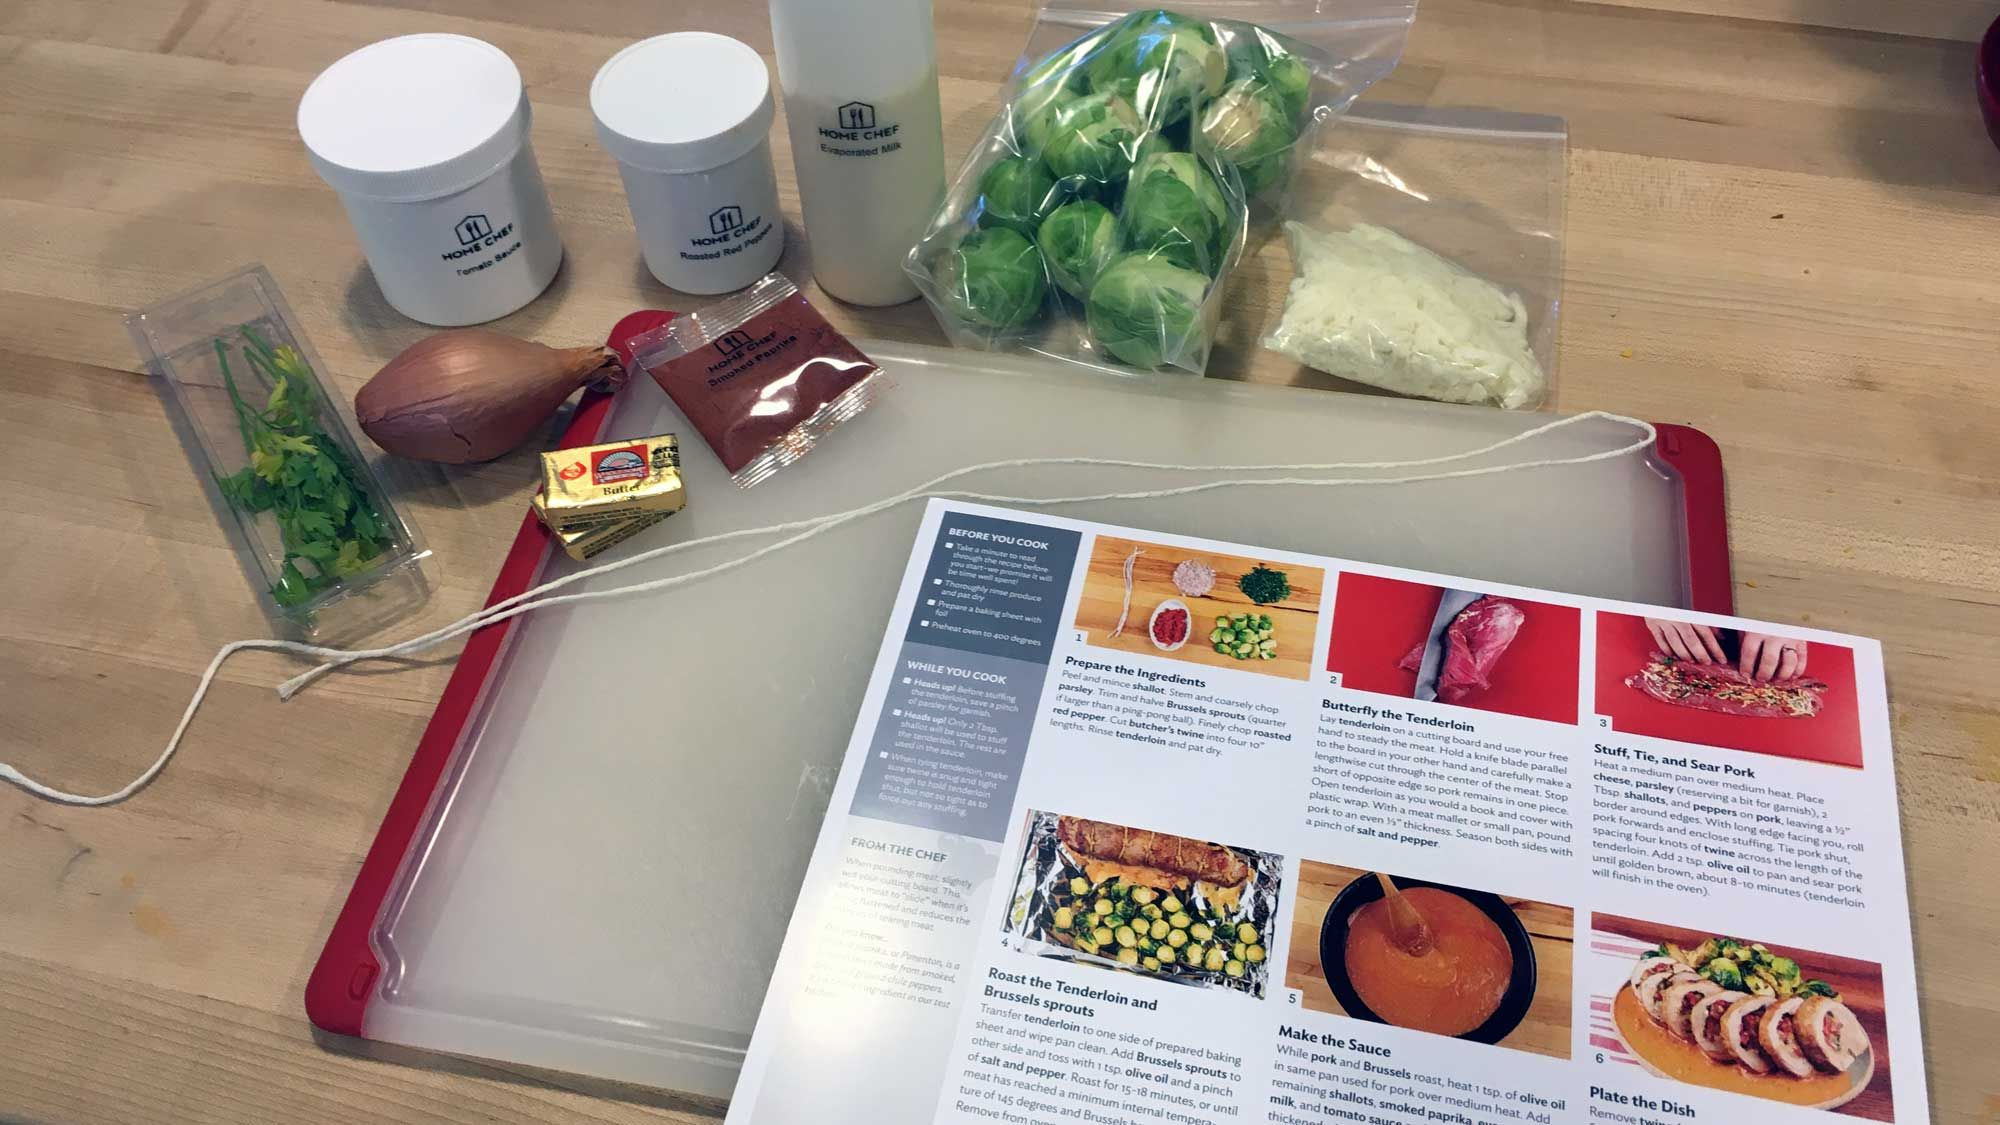 Meal Delivery Comparison Home Chef Vs Hellofresh Vs Blue Apron Vs Freshly Vs Purple Carrot Vs Sunbasket Home Chef Meals Blue Apron